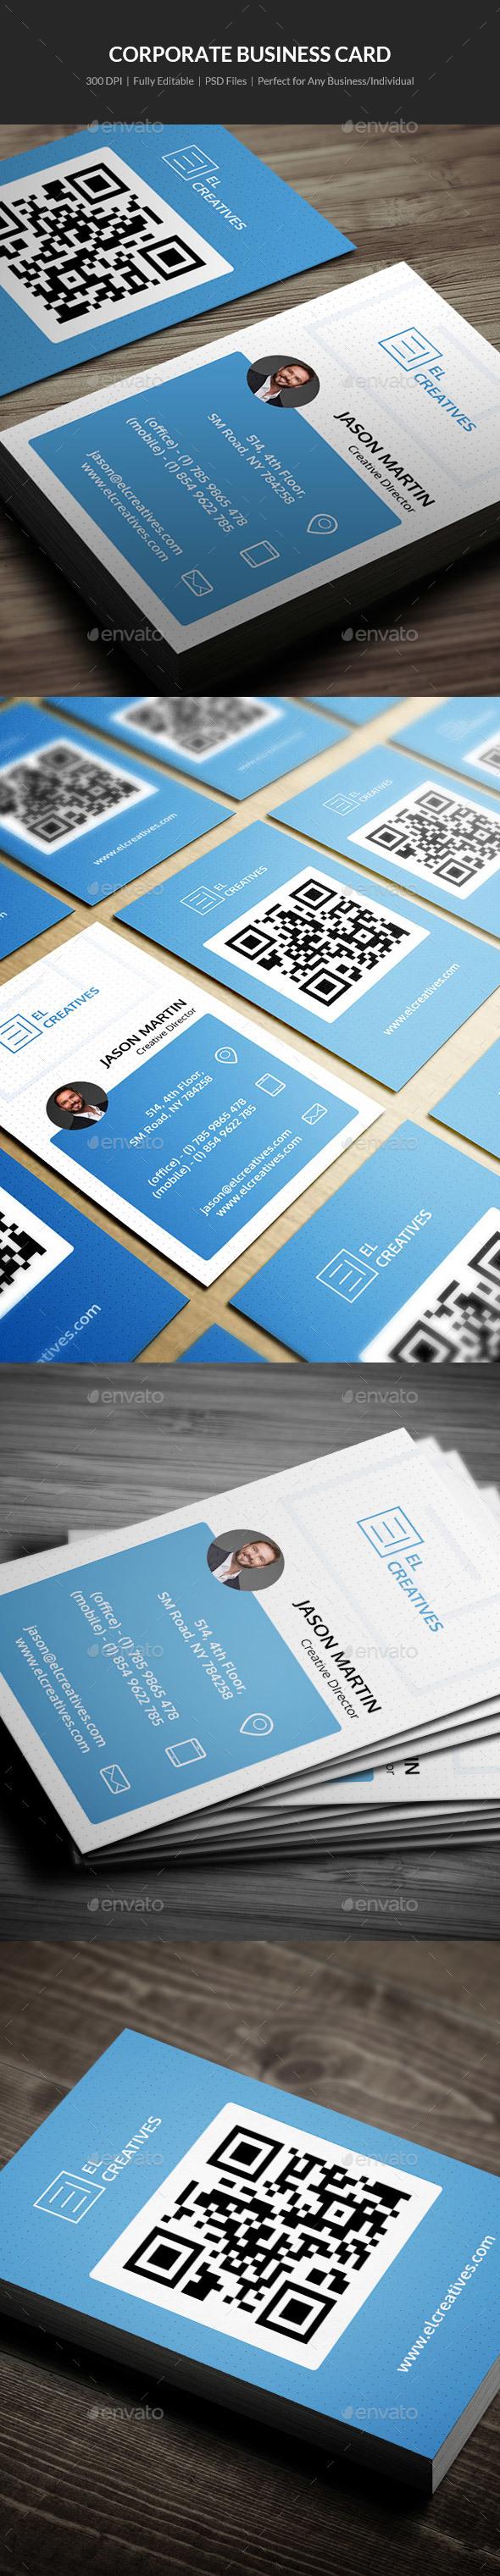 Corporate Business Card - 04 - Corporate Business Cards